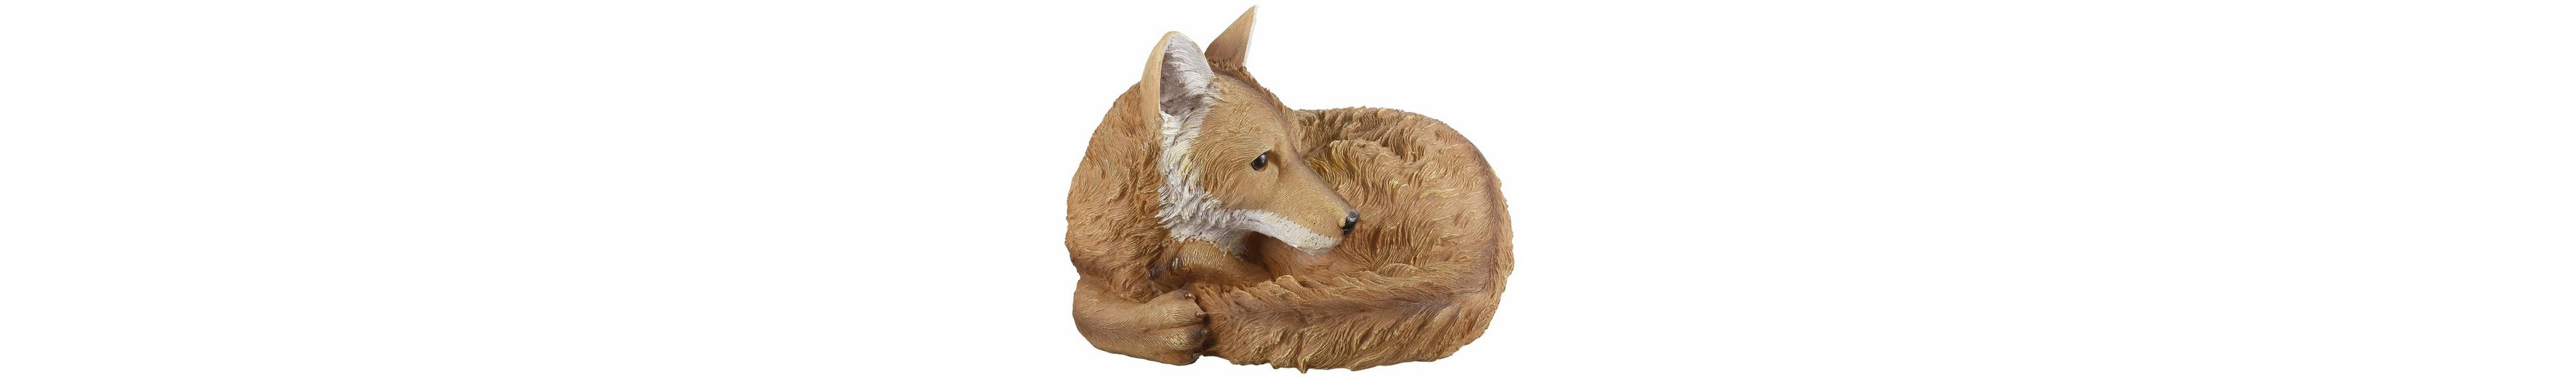 Home affaire Dekofigur »Fuchs liegend«